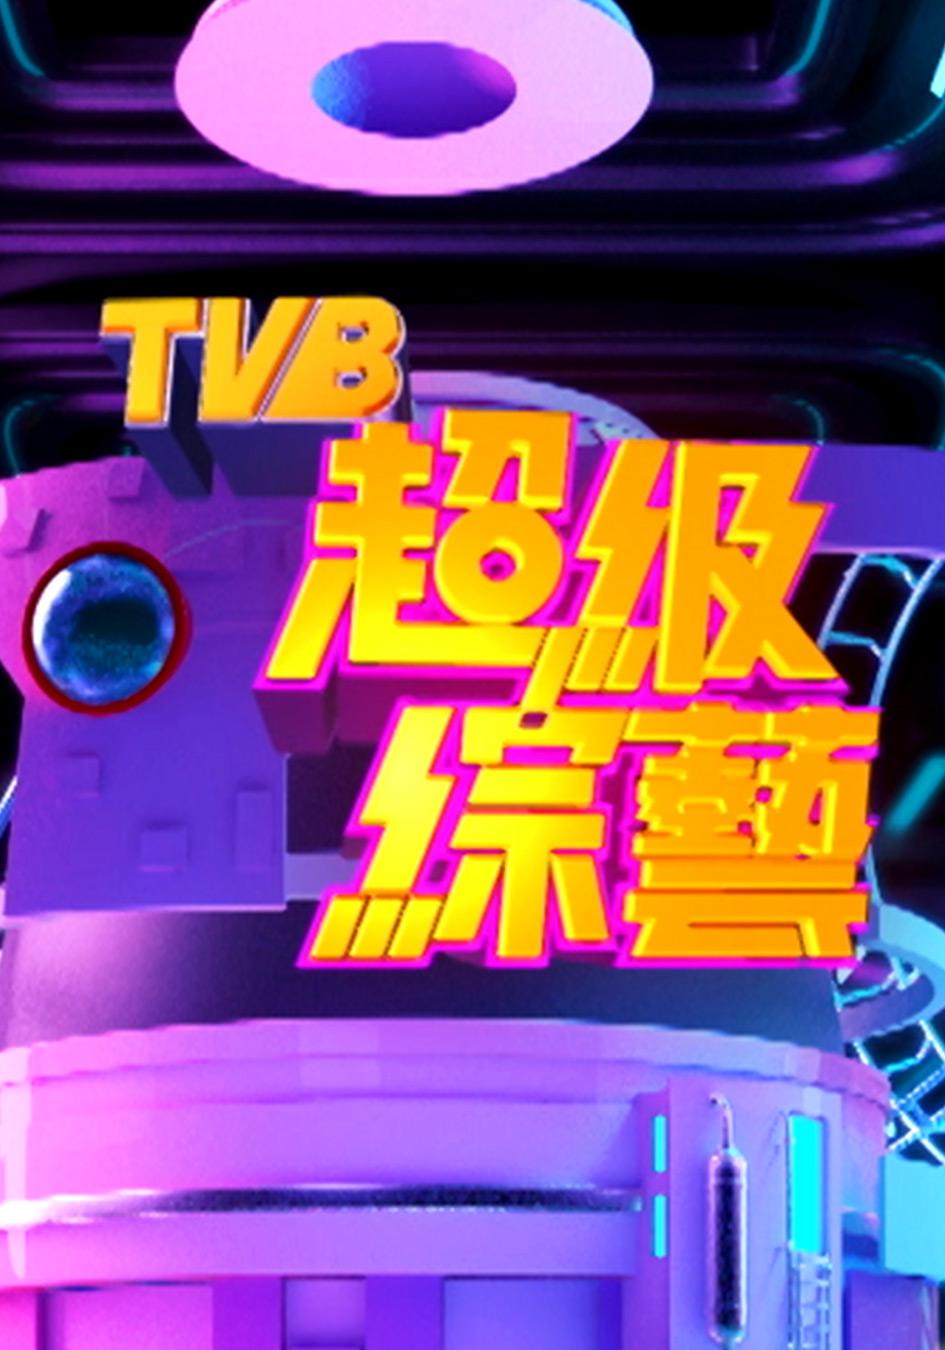 超級綜藝隆重登場-Super Variety Show Reel